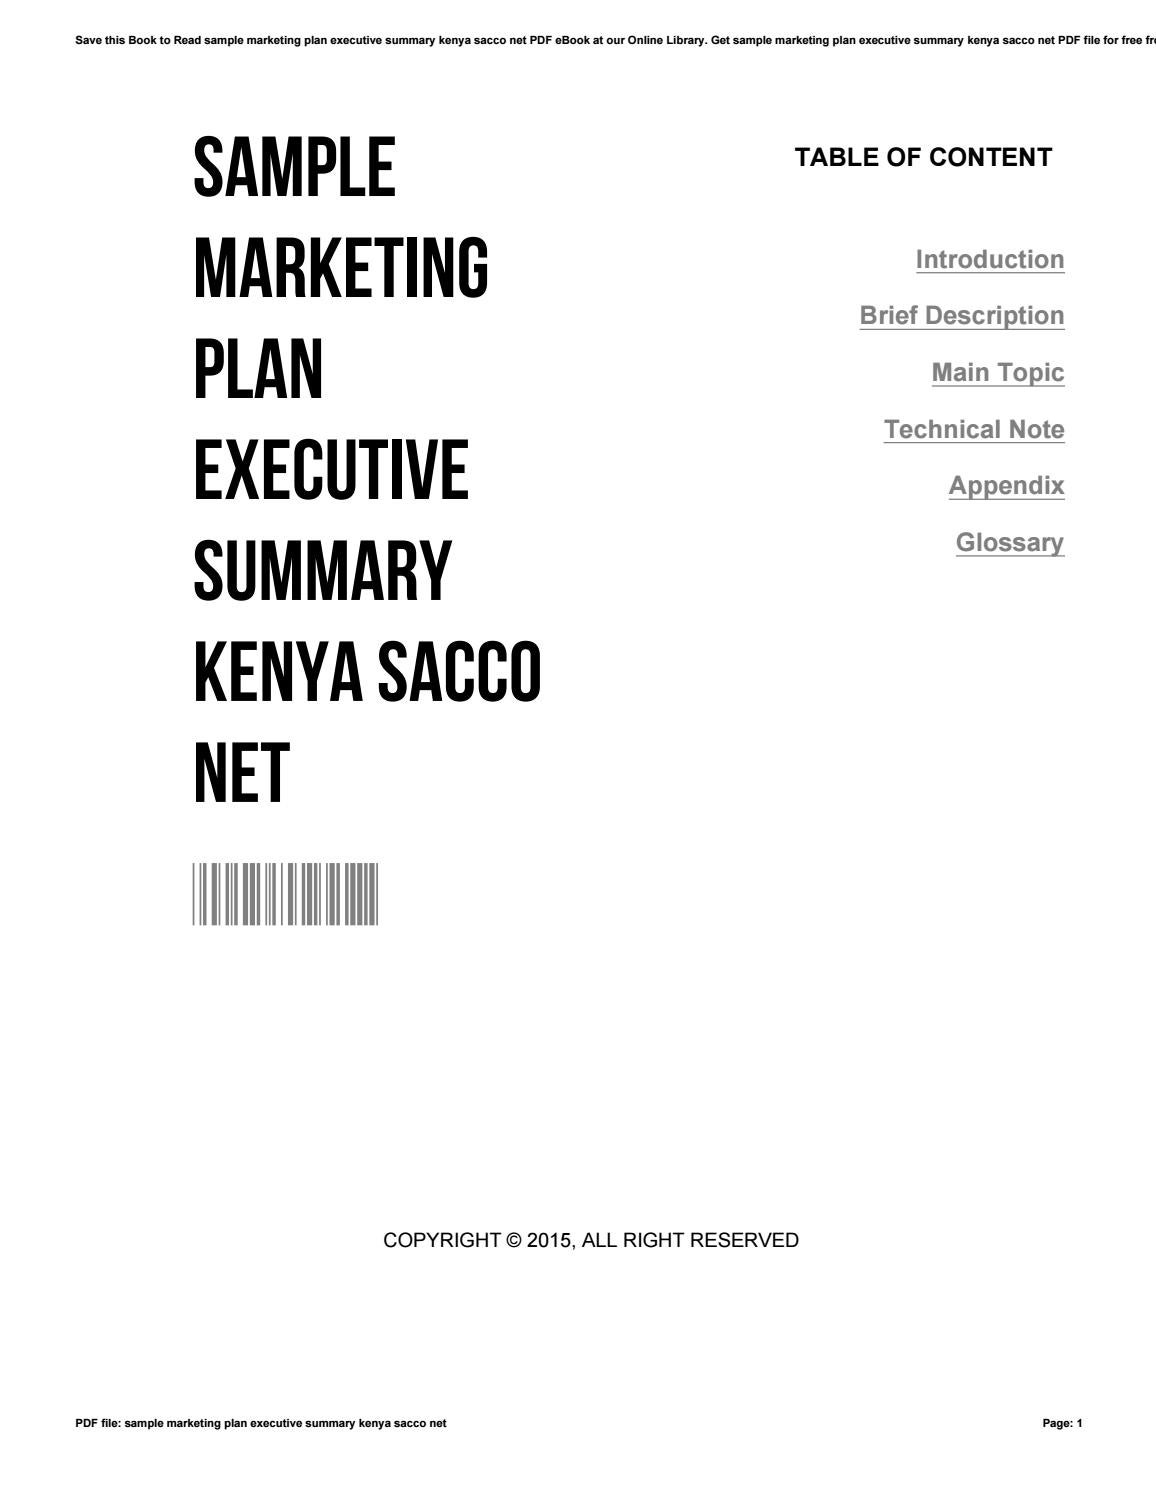 Sample marketing plan executive summary kenya sacco net by